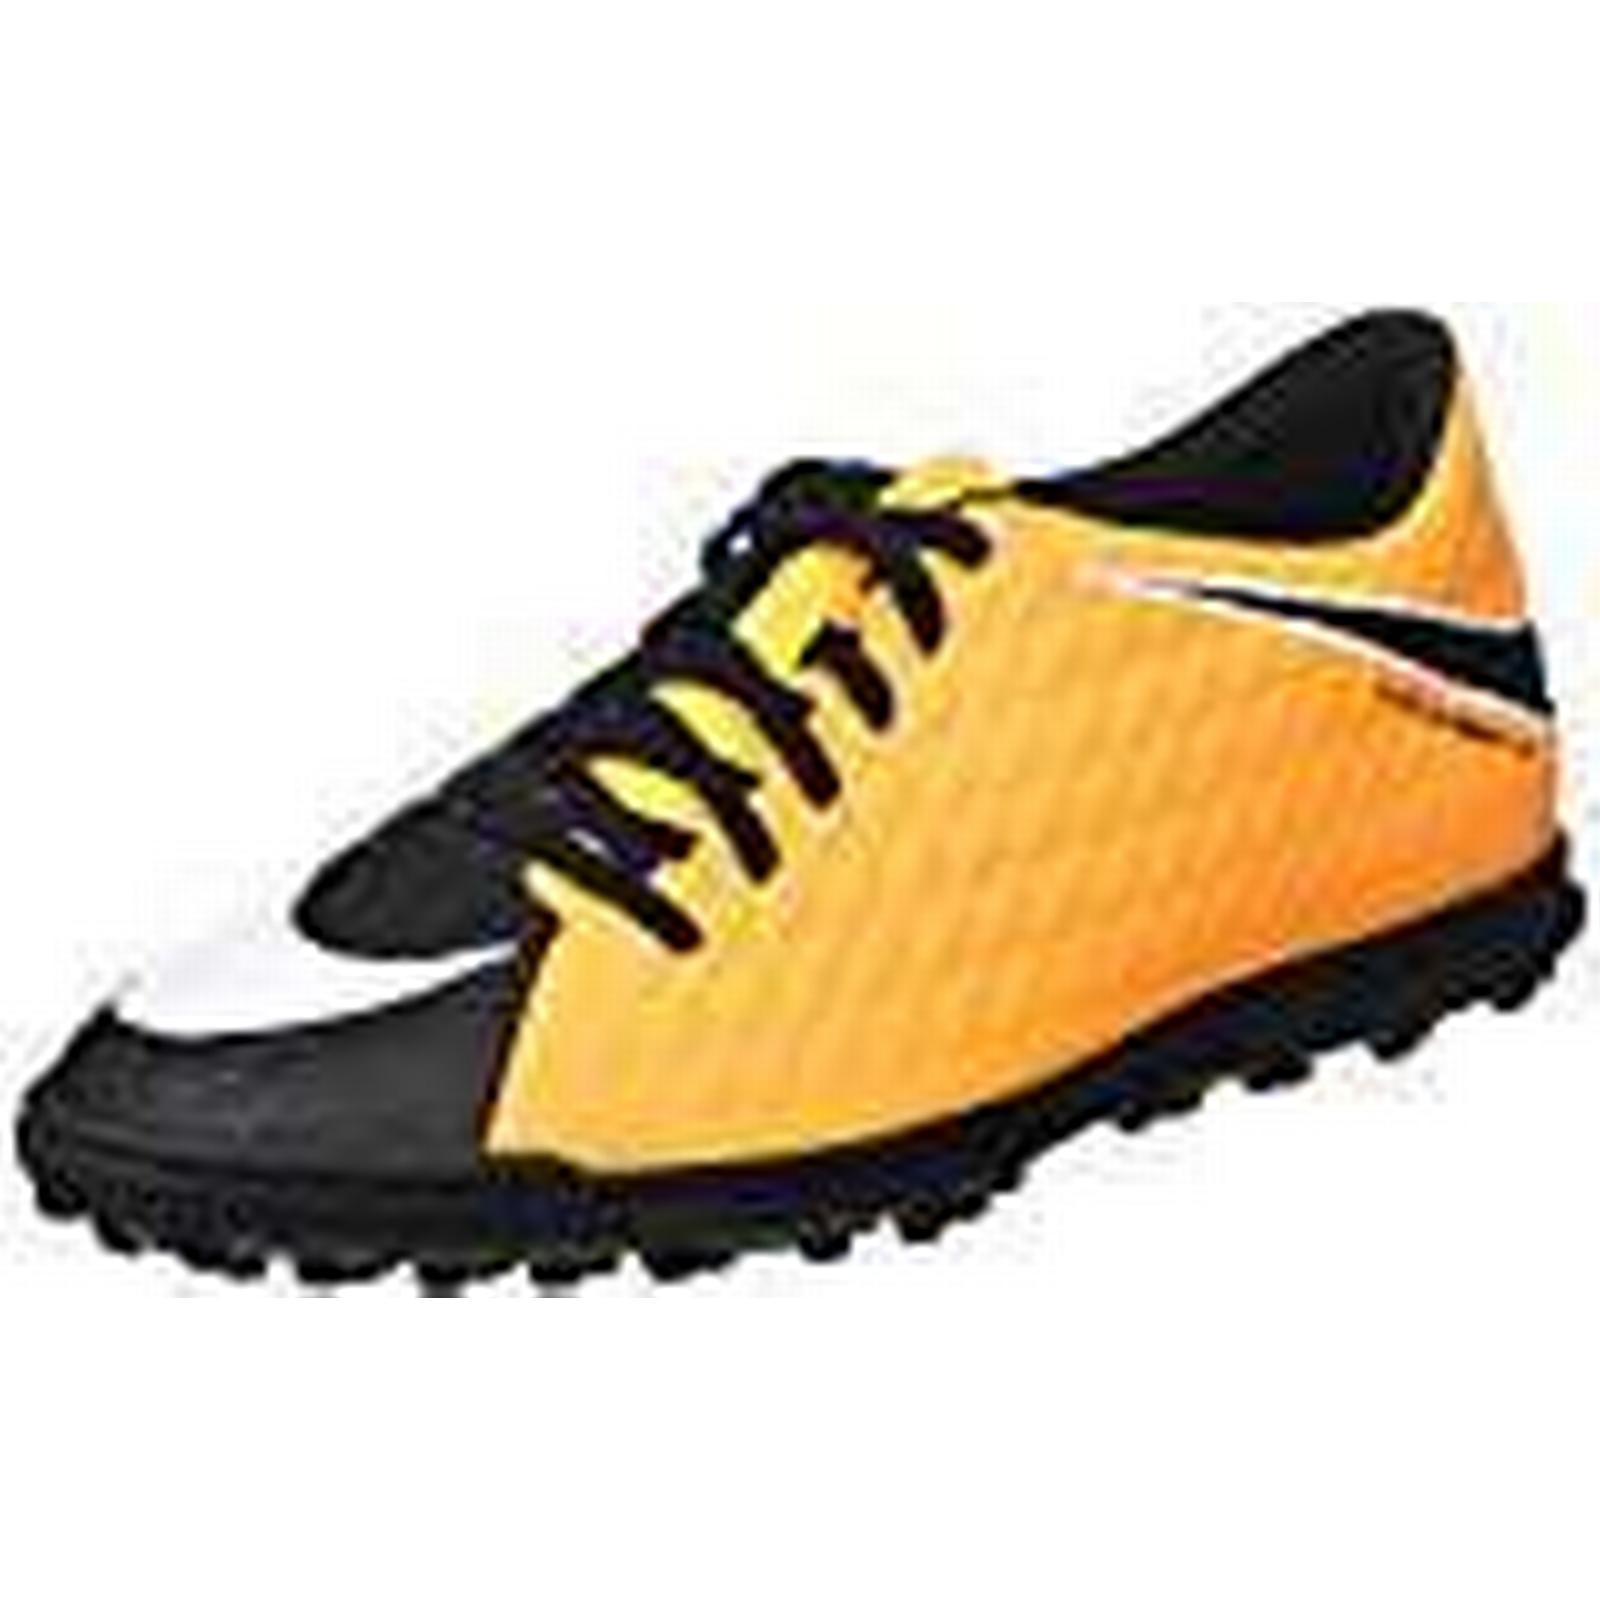 NIKE Men's Hypervenomx Phade Iii Tf Football Boots UK (Laser Orange Black/Volt/White), 9.5 UK Boots 44.5 EU f3b103